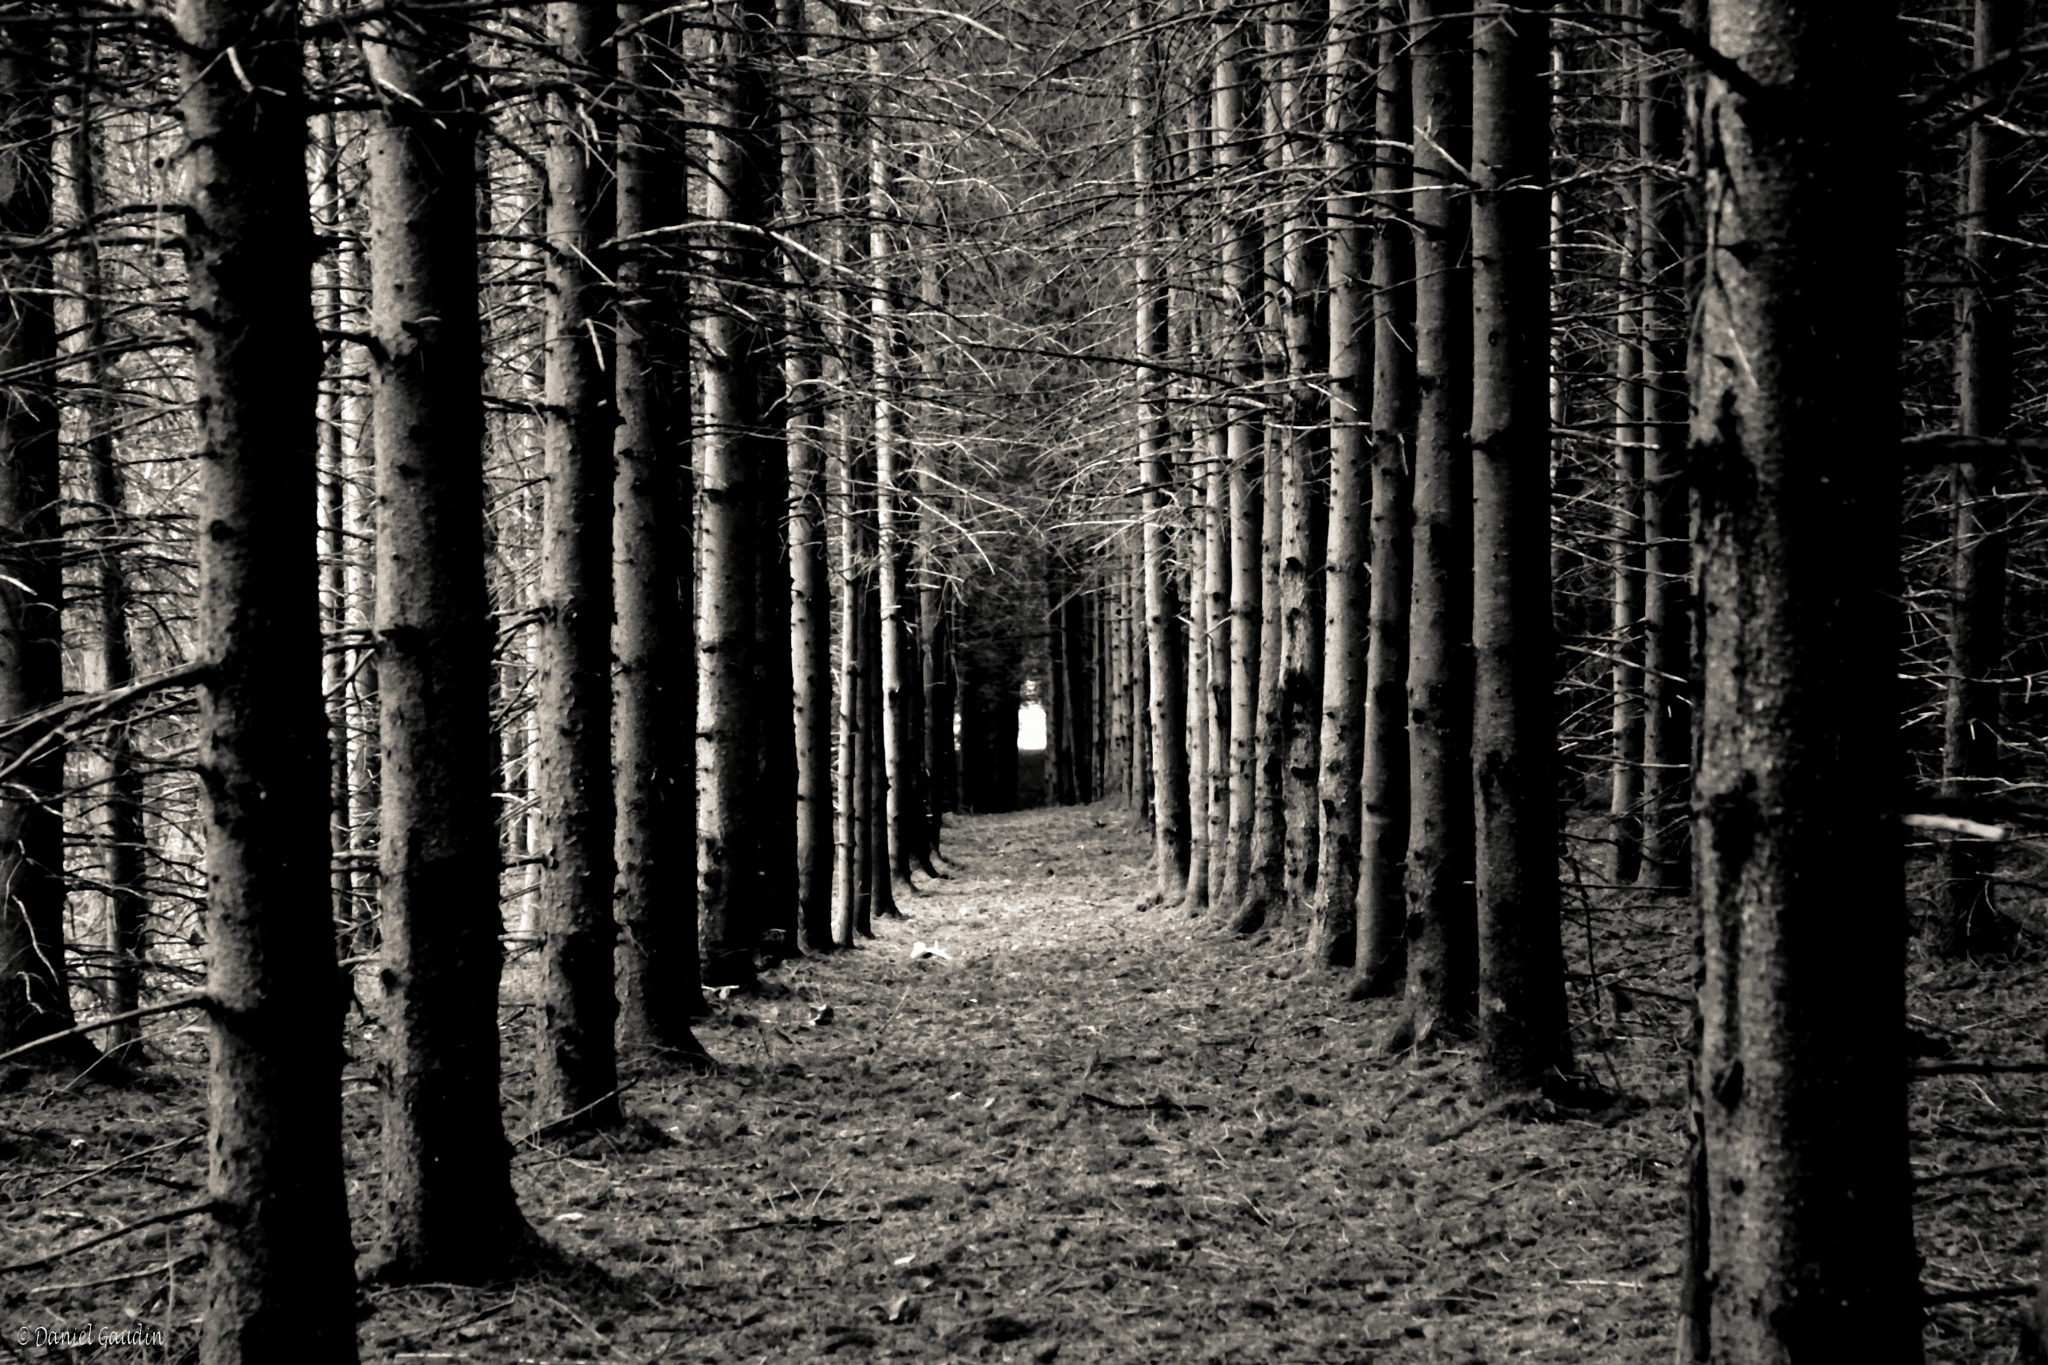 Untitled by Daniel Gaudin Photographe